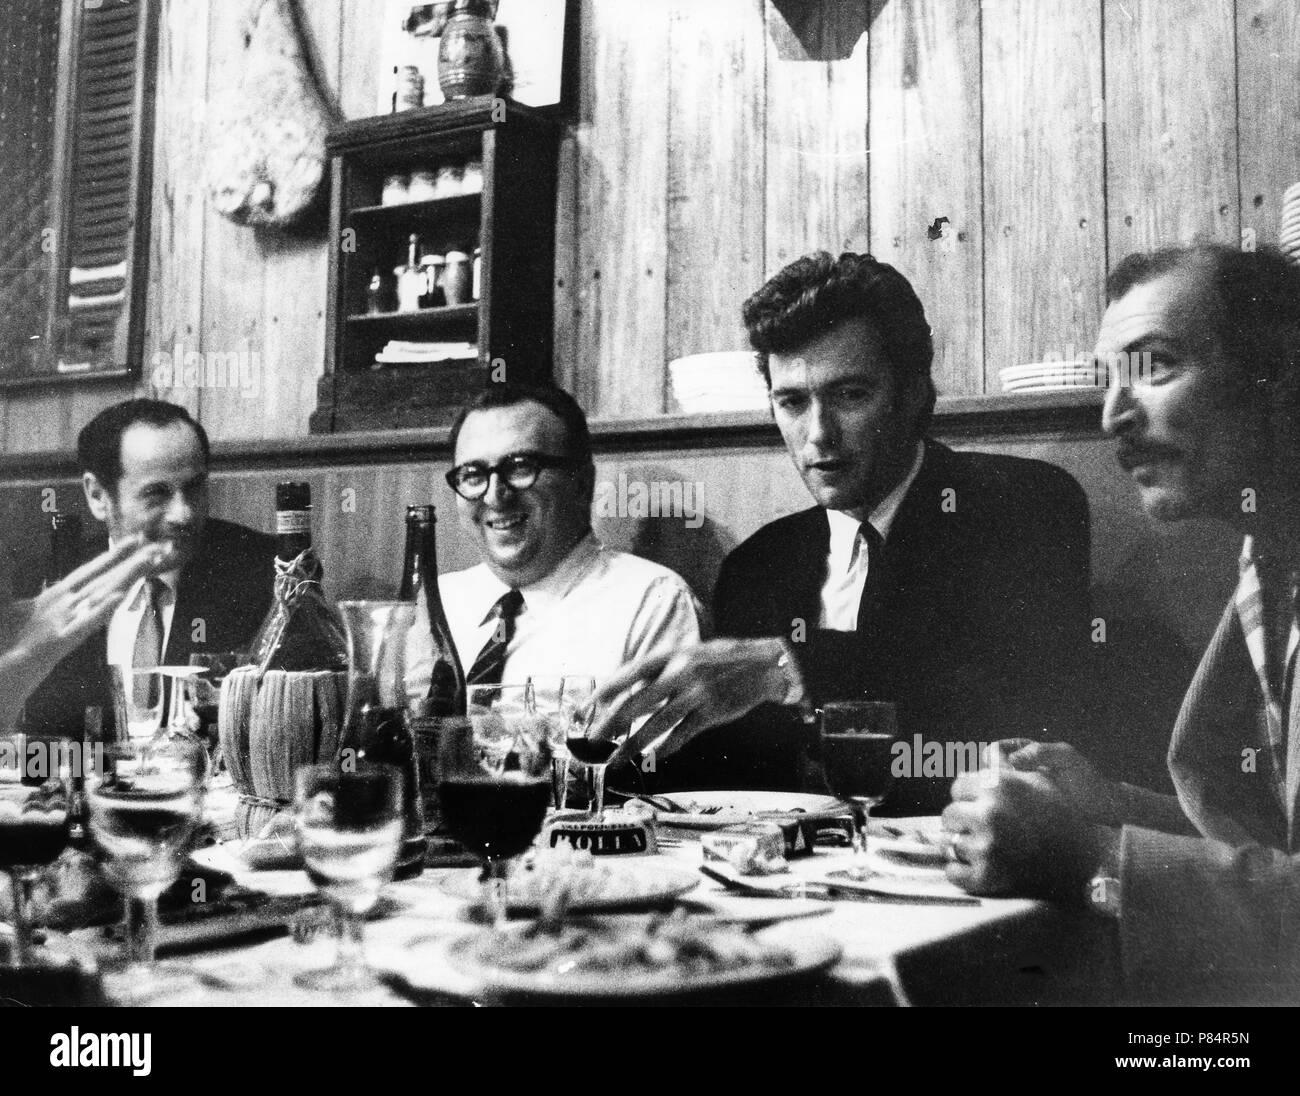 clint eastwood, lee van cleef, sergio leone, eli wallach, rome 1966 Stock Photo